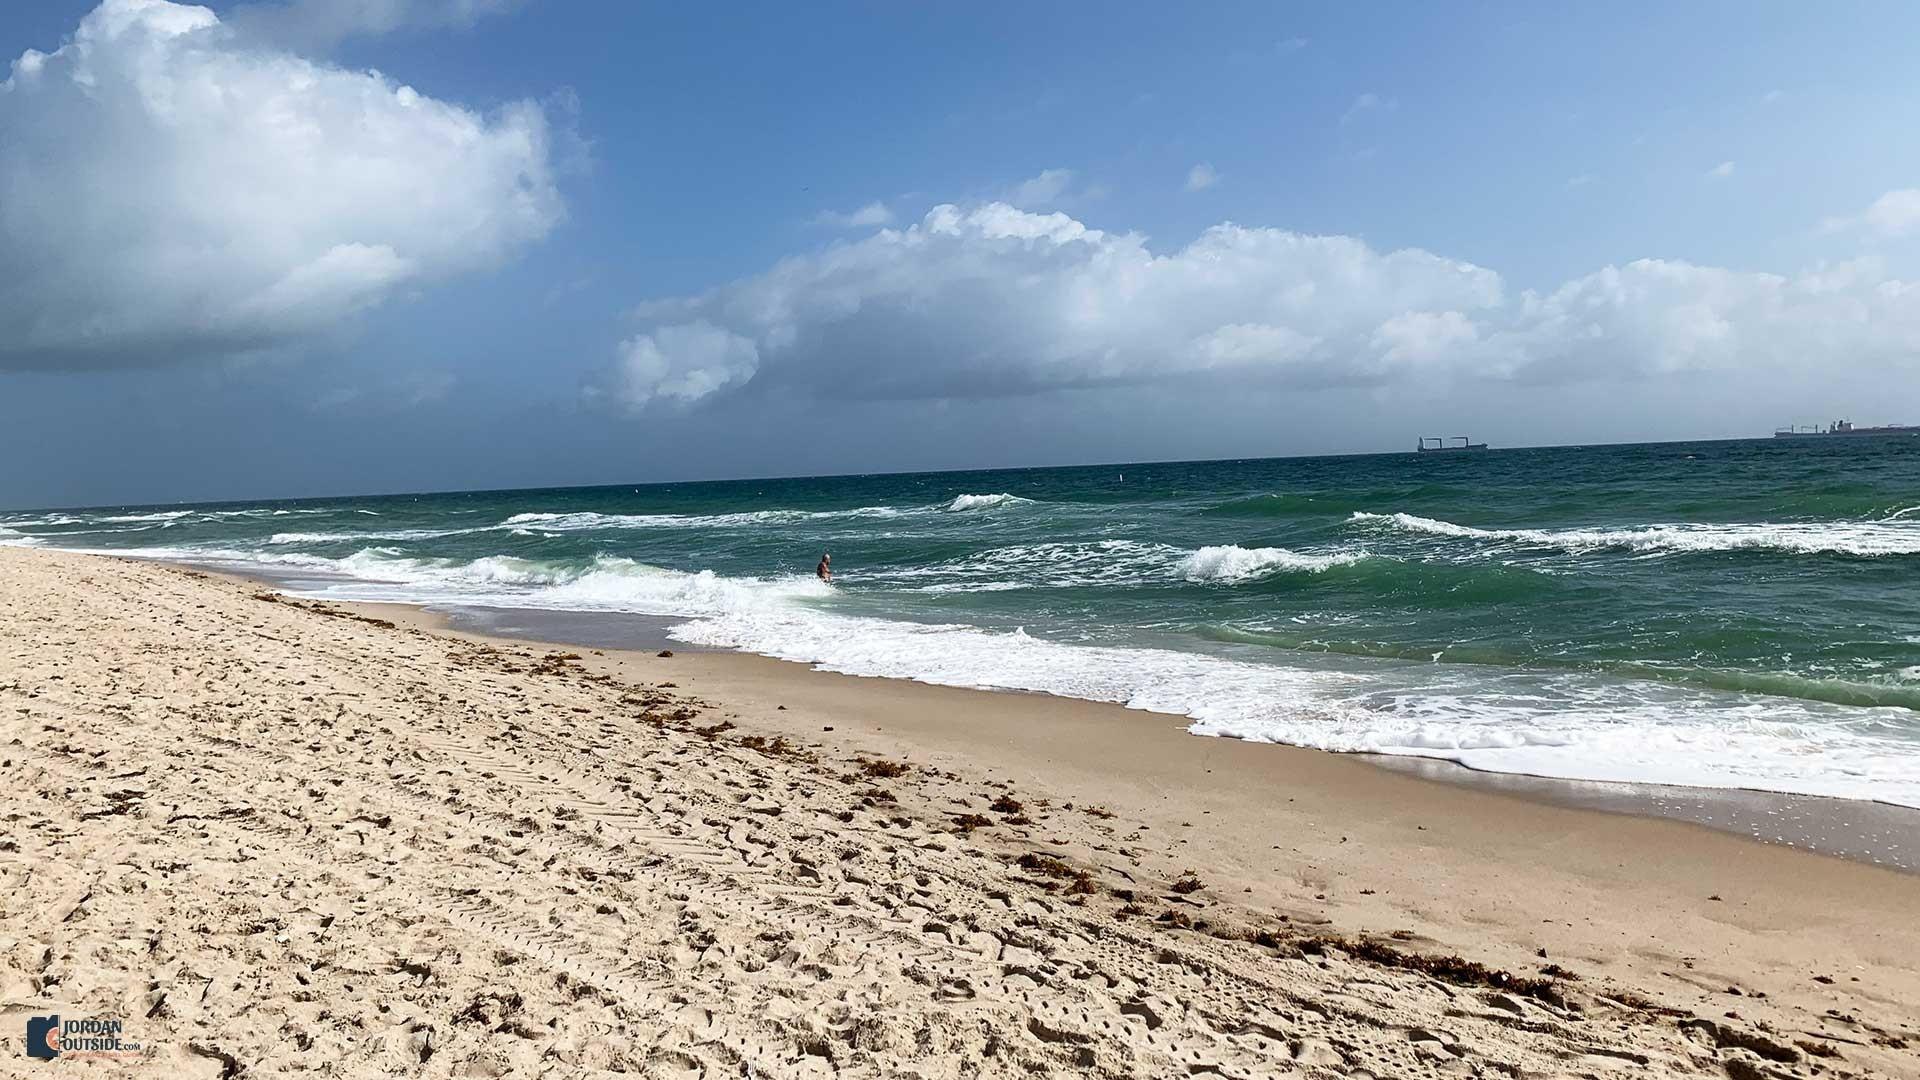 Ft. Lauderdale Beach, Florida